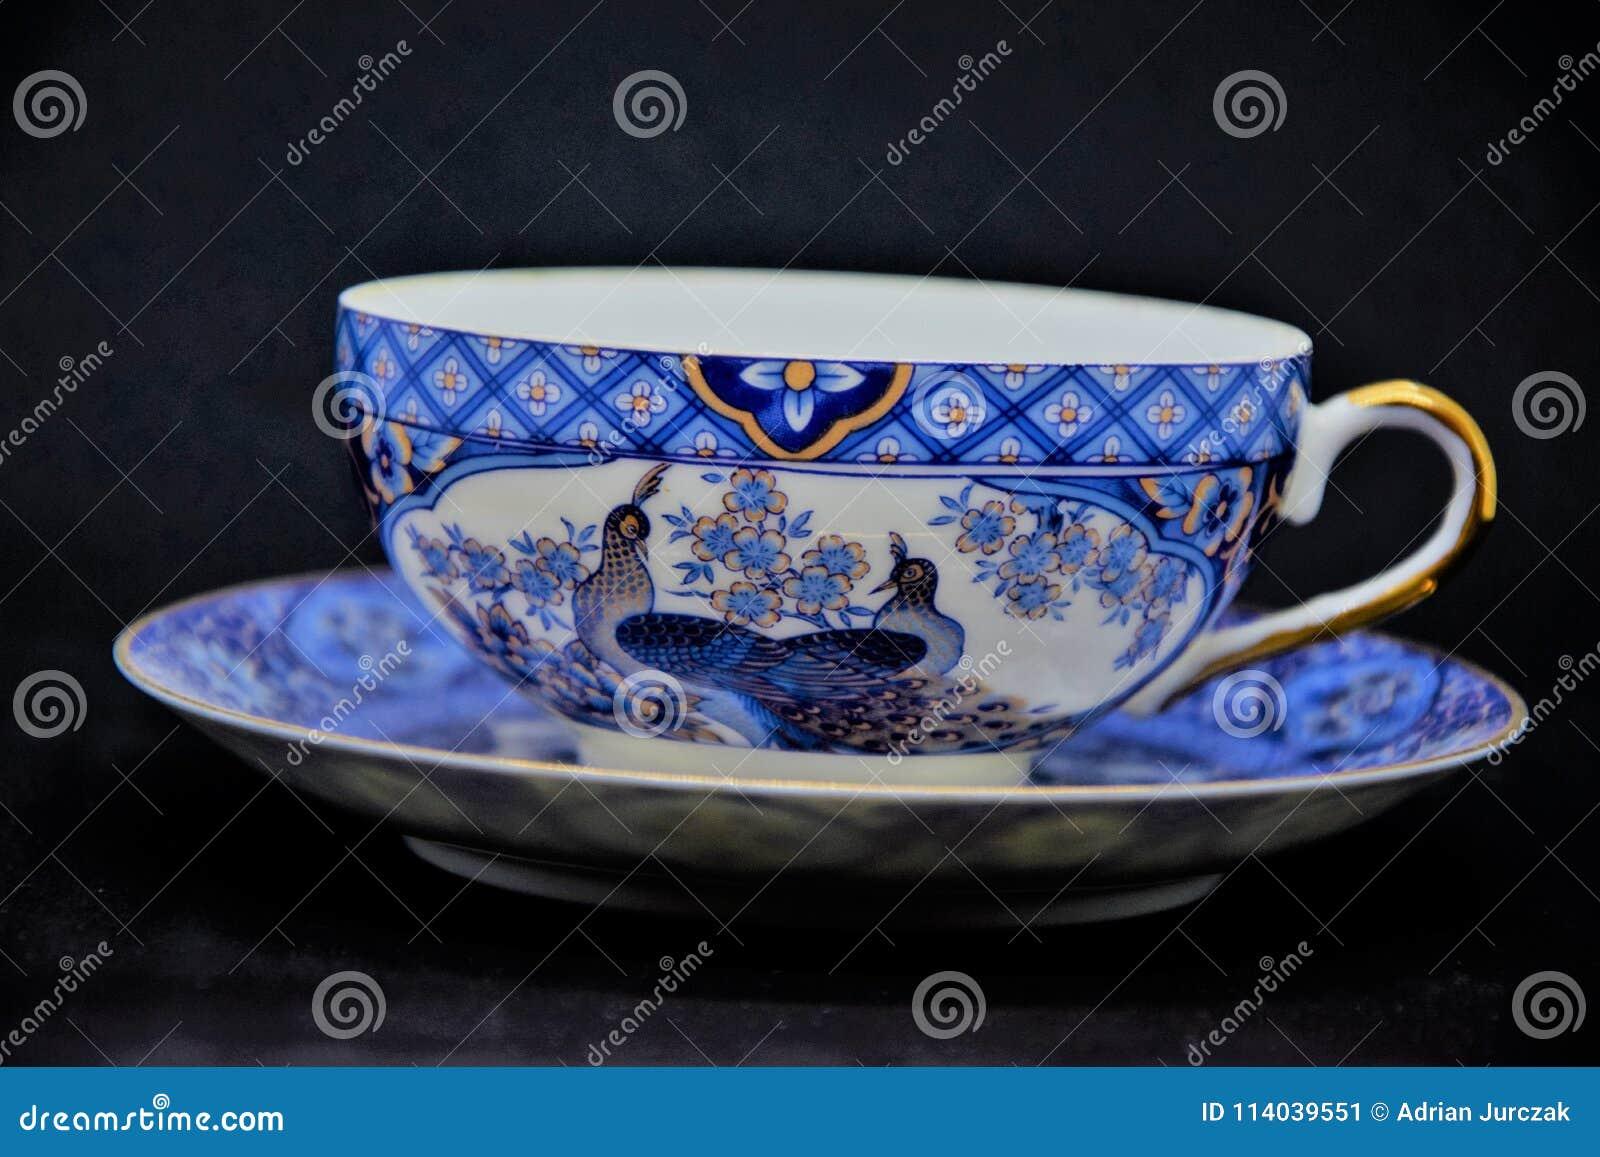 Old china porcelain.